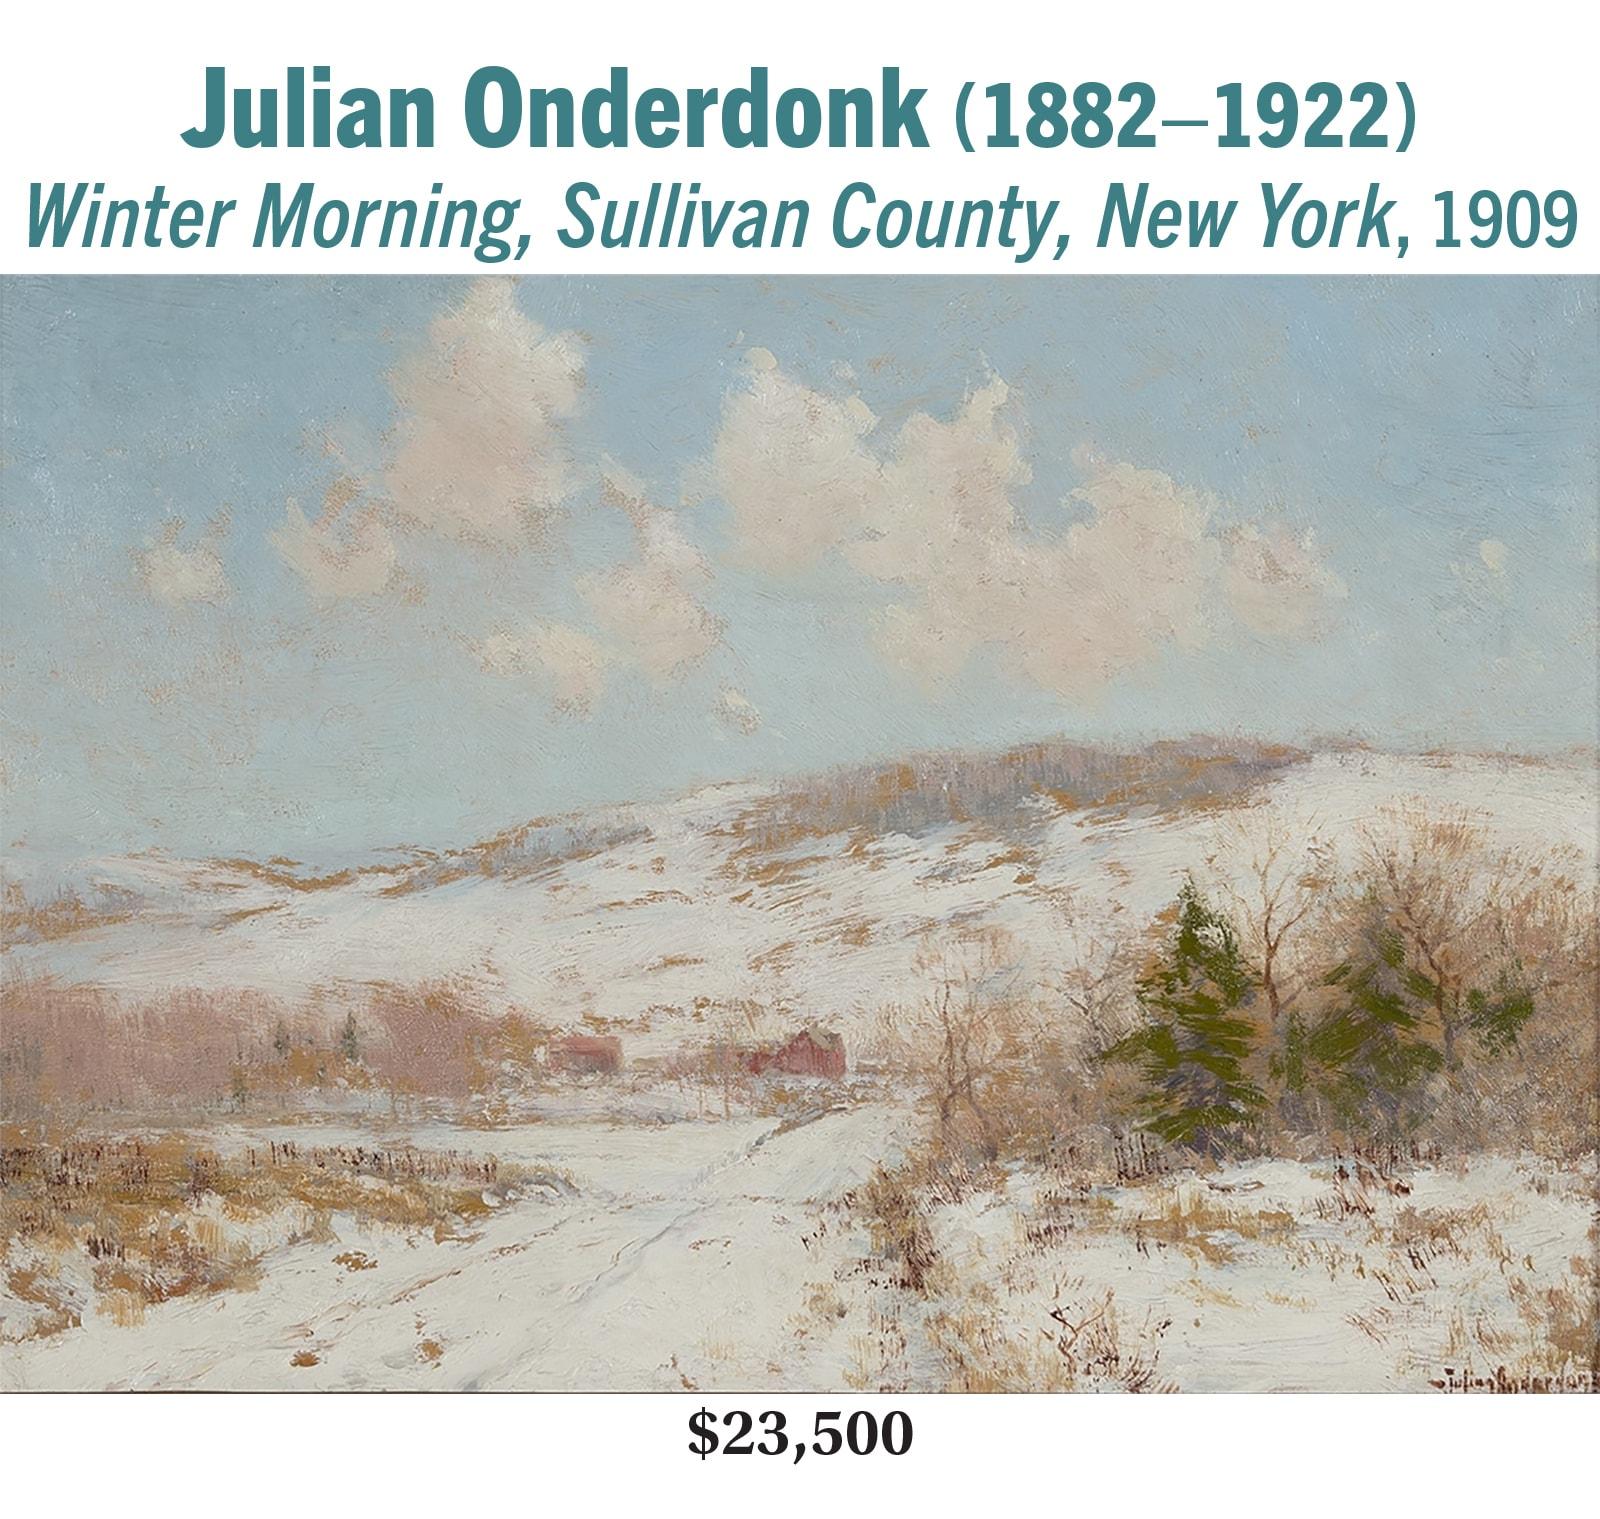 Julian Onderdonk (1882–1922), Winter Morning, Sullivan County, New York, 1909, oil on panel, American impressionist landscape painting